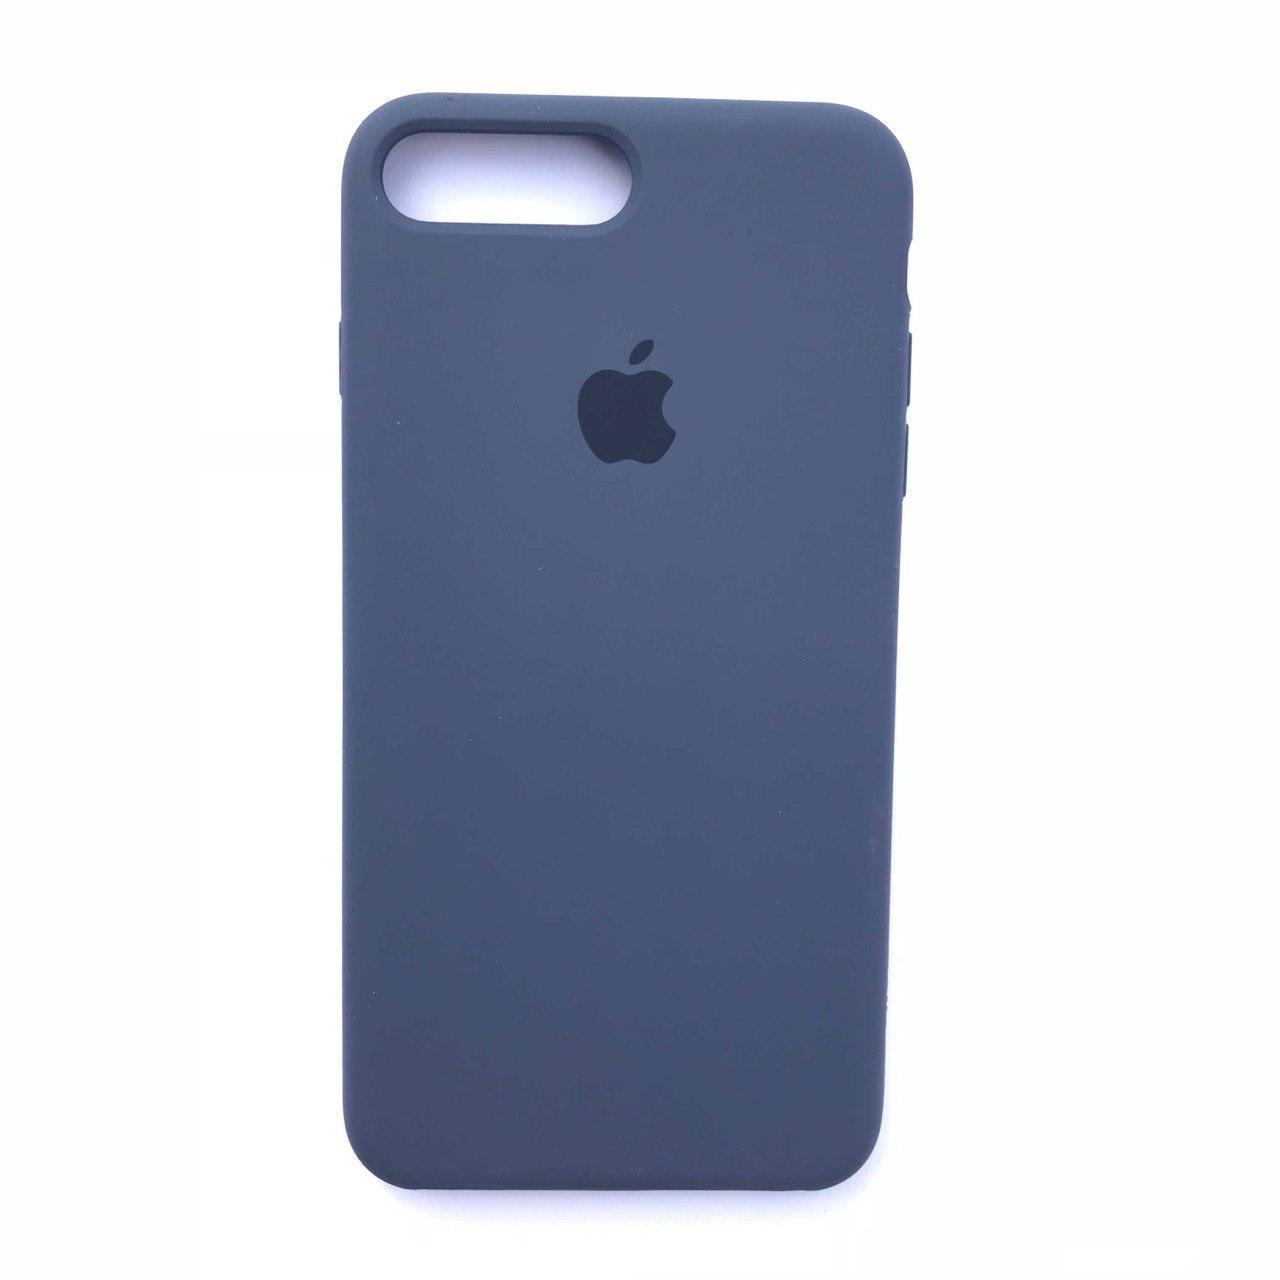 Чехол-накладка Silicone Case для Apple iPhone 7 Plus iPhone 8 Plus Midnight Blue